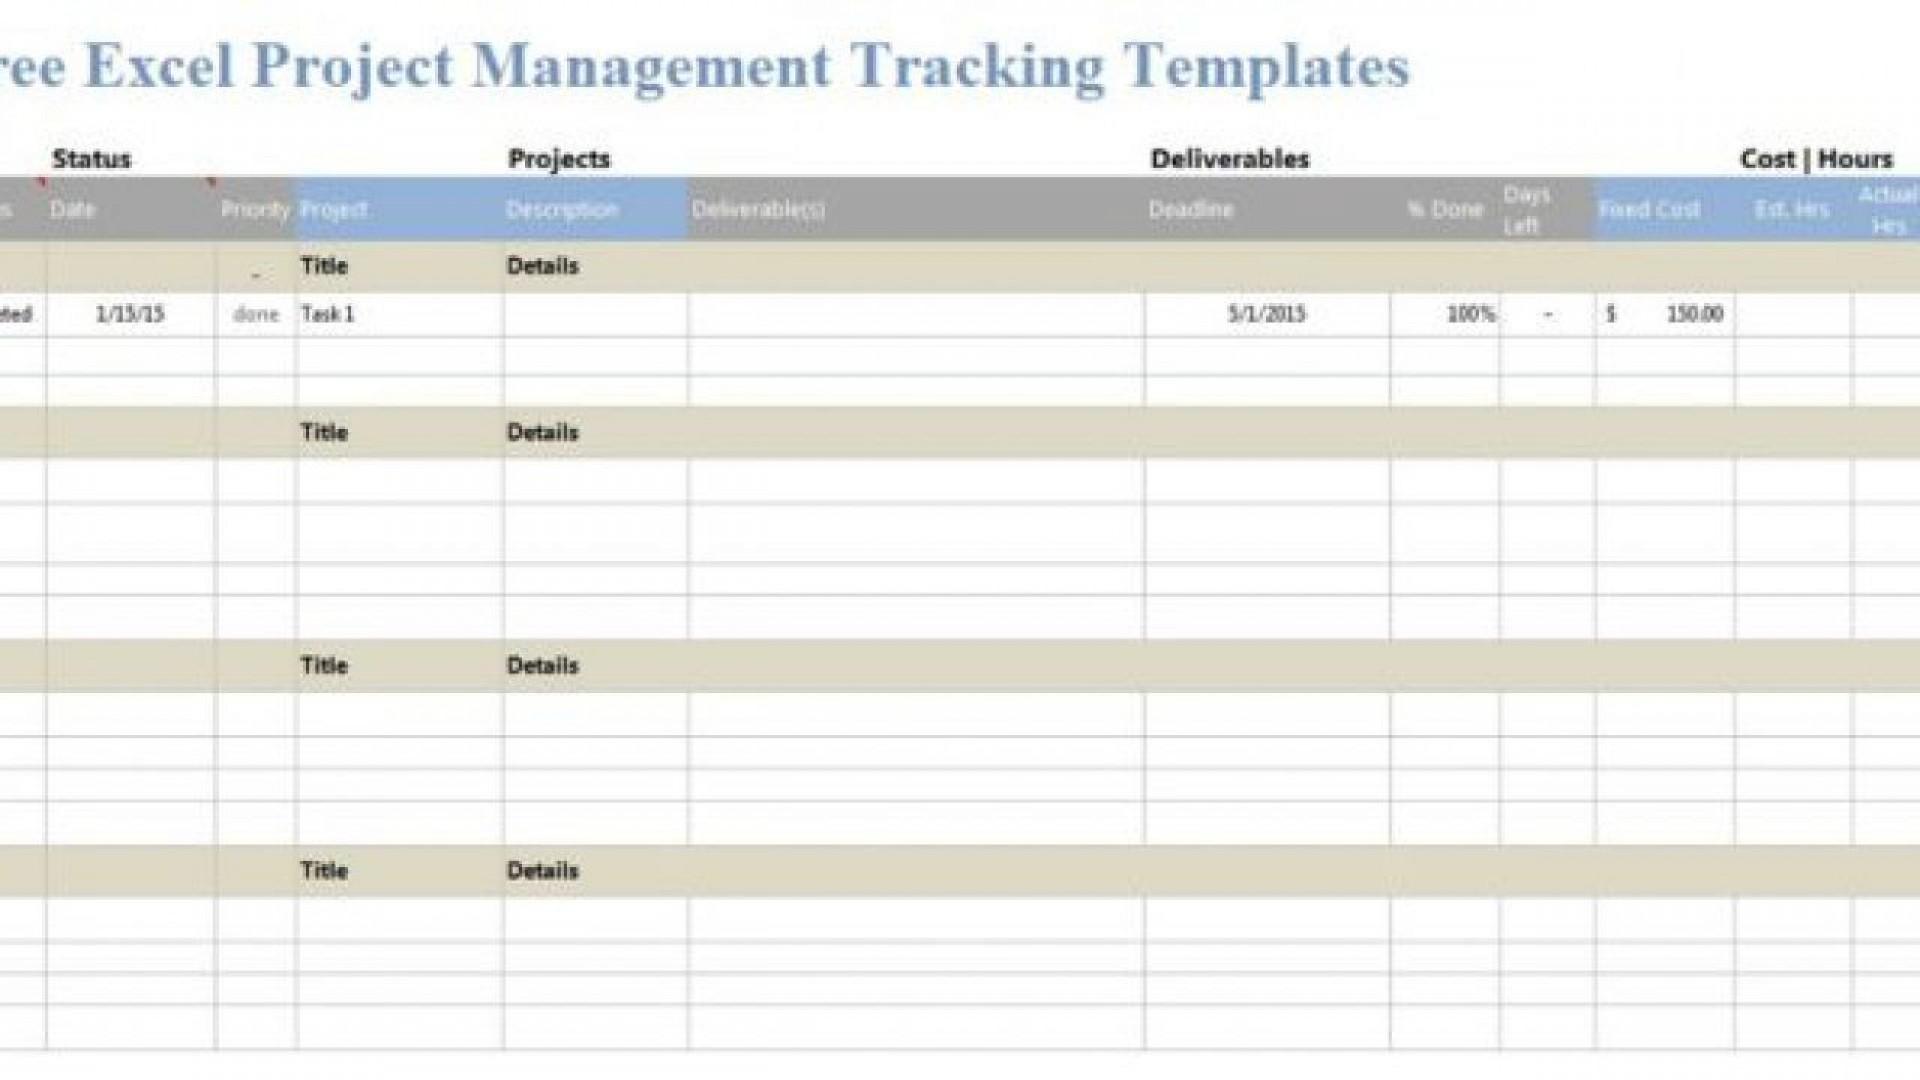 005 Impressive Project Management Template Free Excel Idea  Portfolio Construction Tracking1920